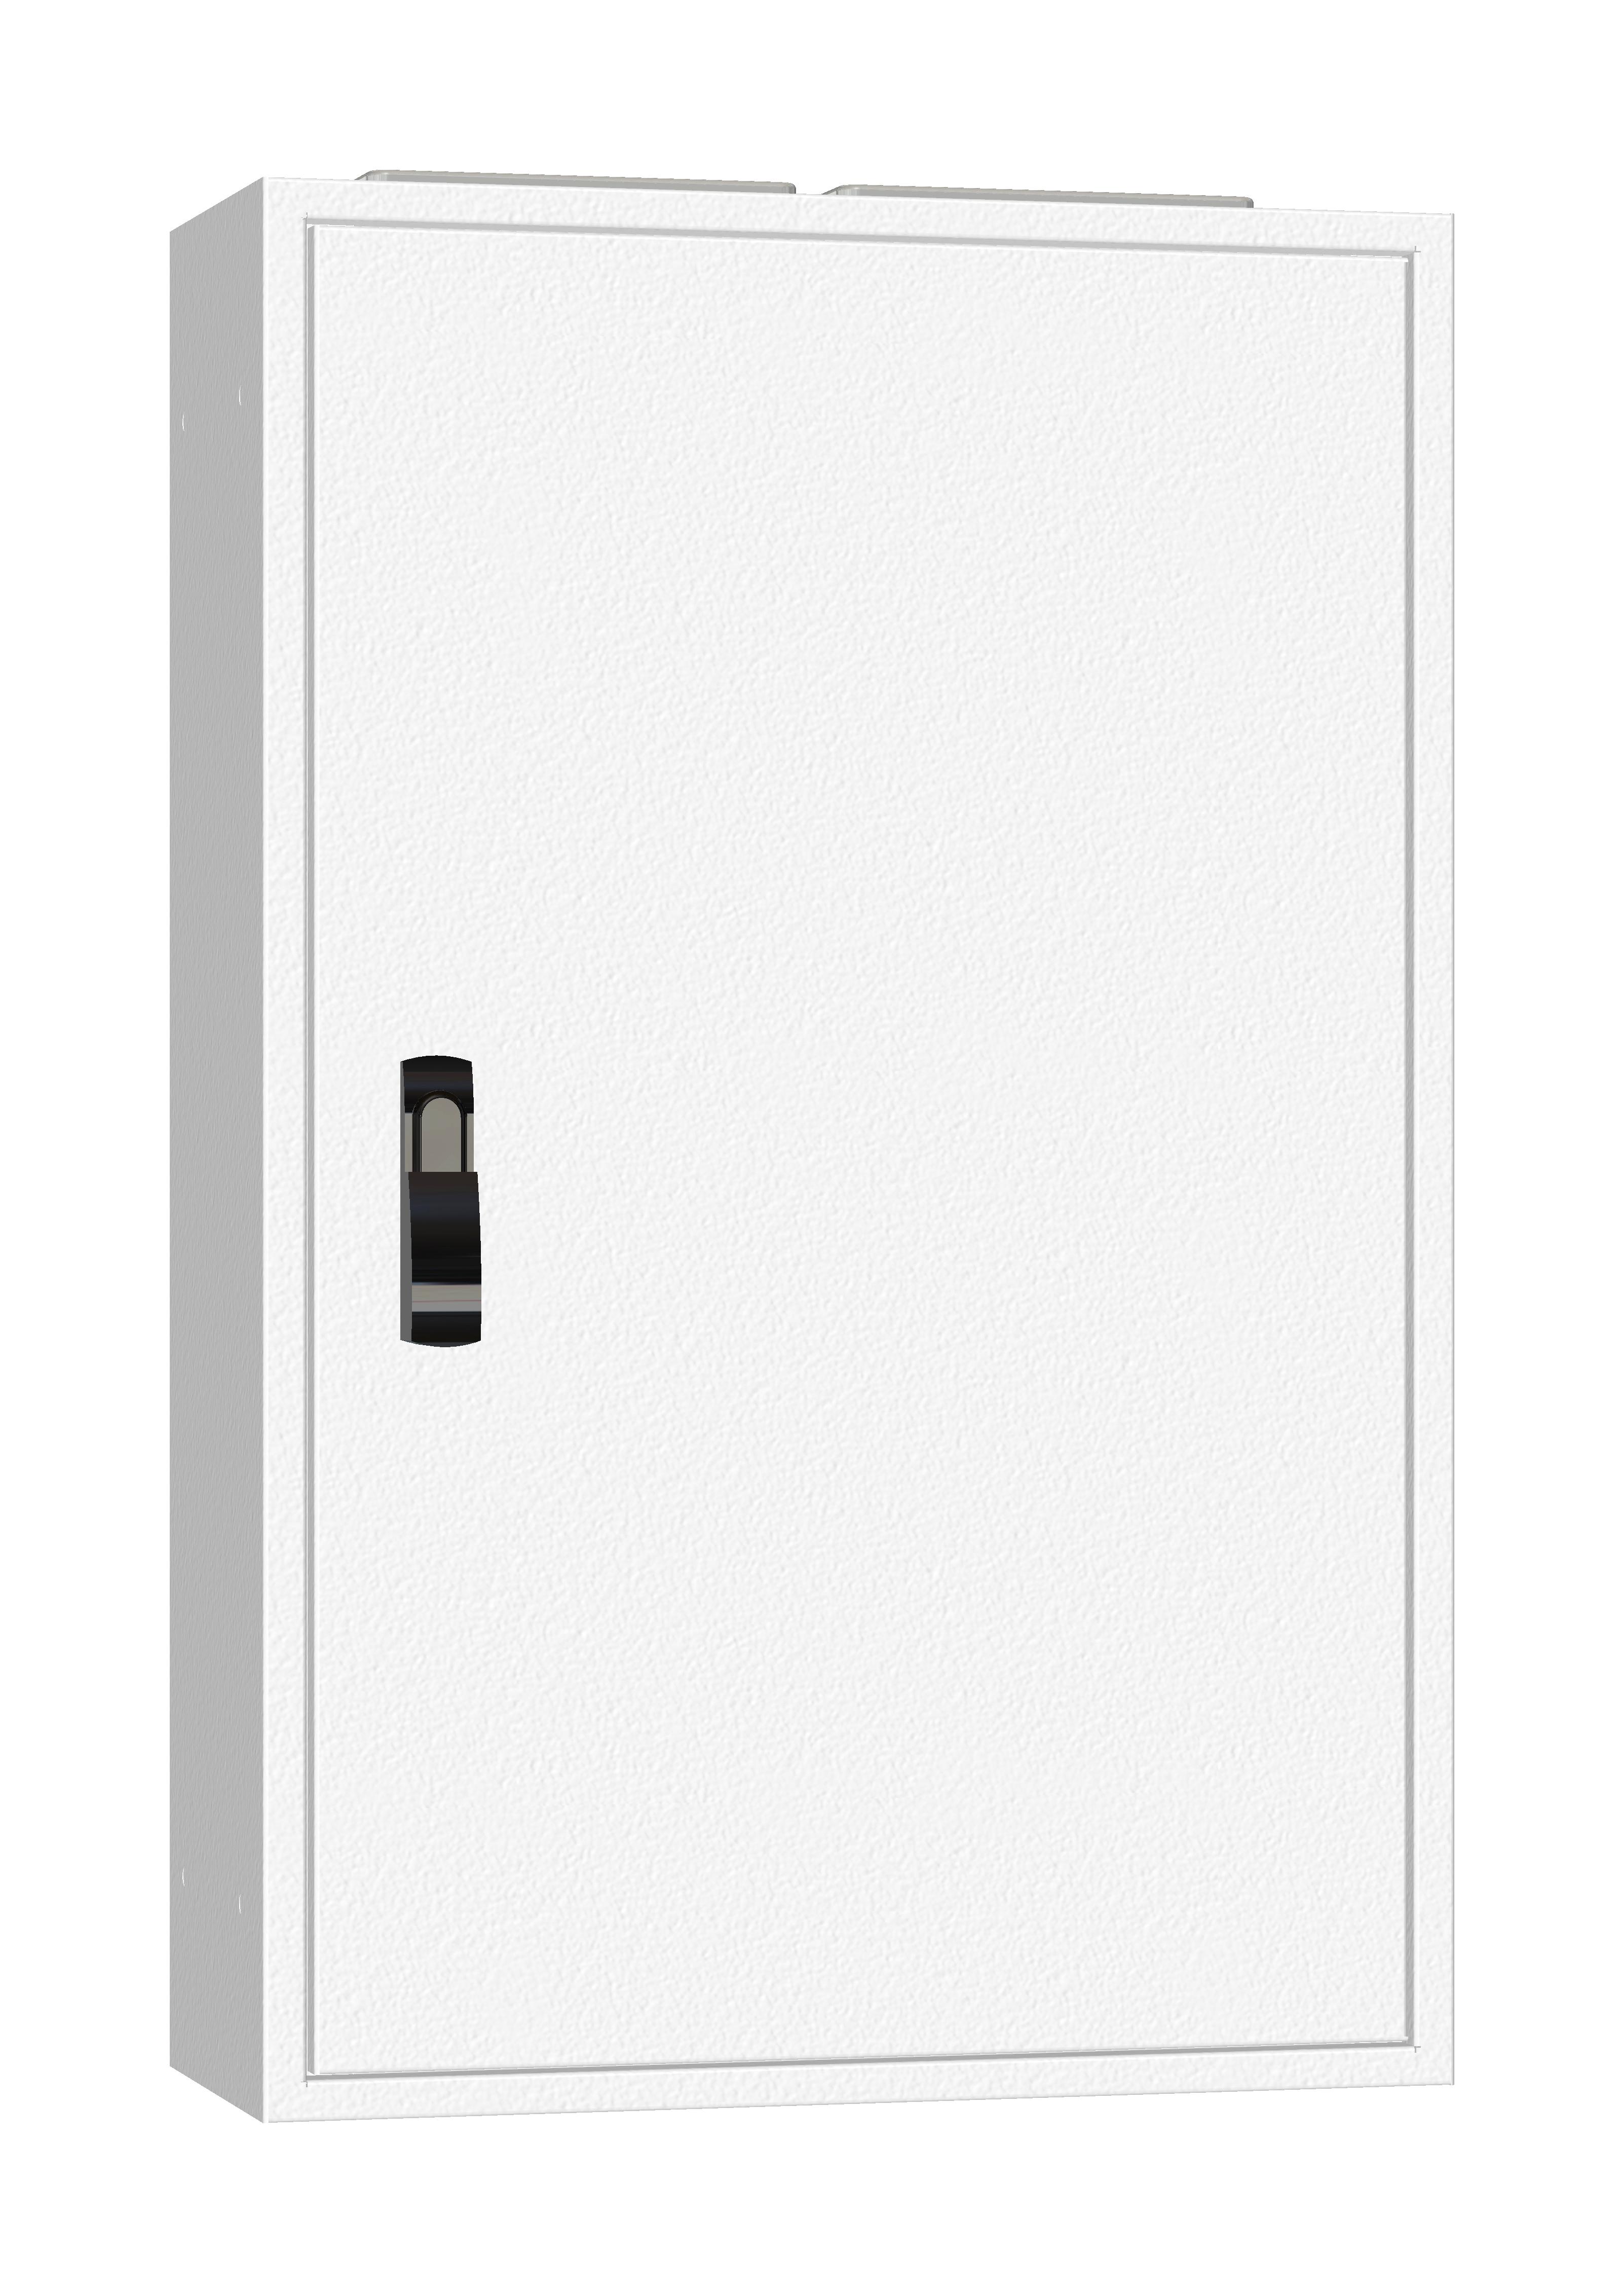 1 Stk AP-Rahmen + Tür 2A-18 T=250mm, Rückwand + Schwenkhebel, IP54 IL952218--